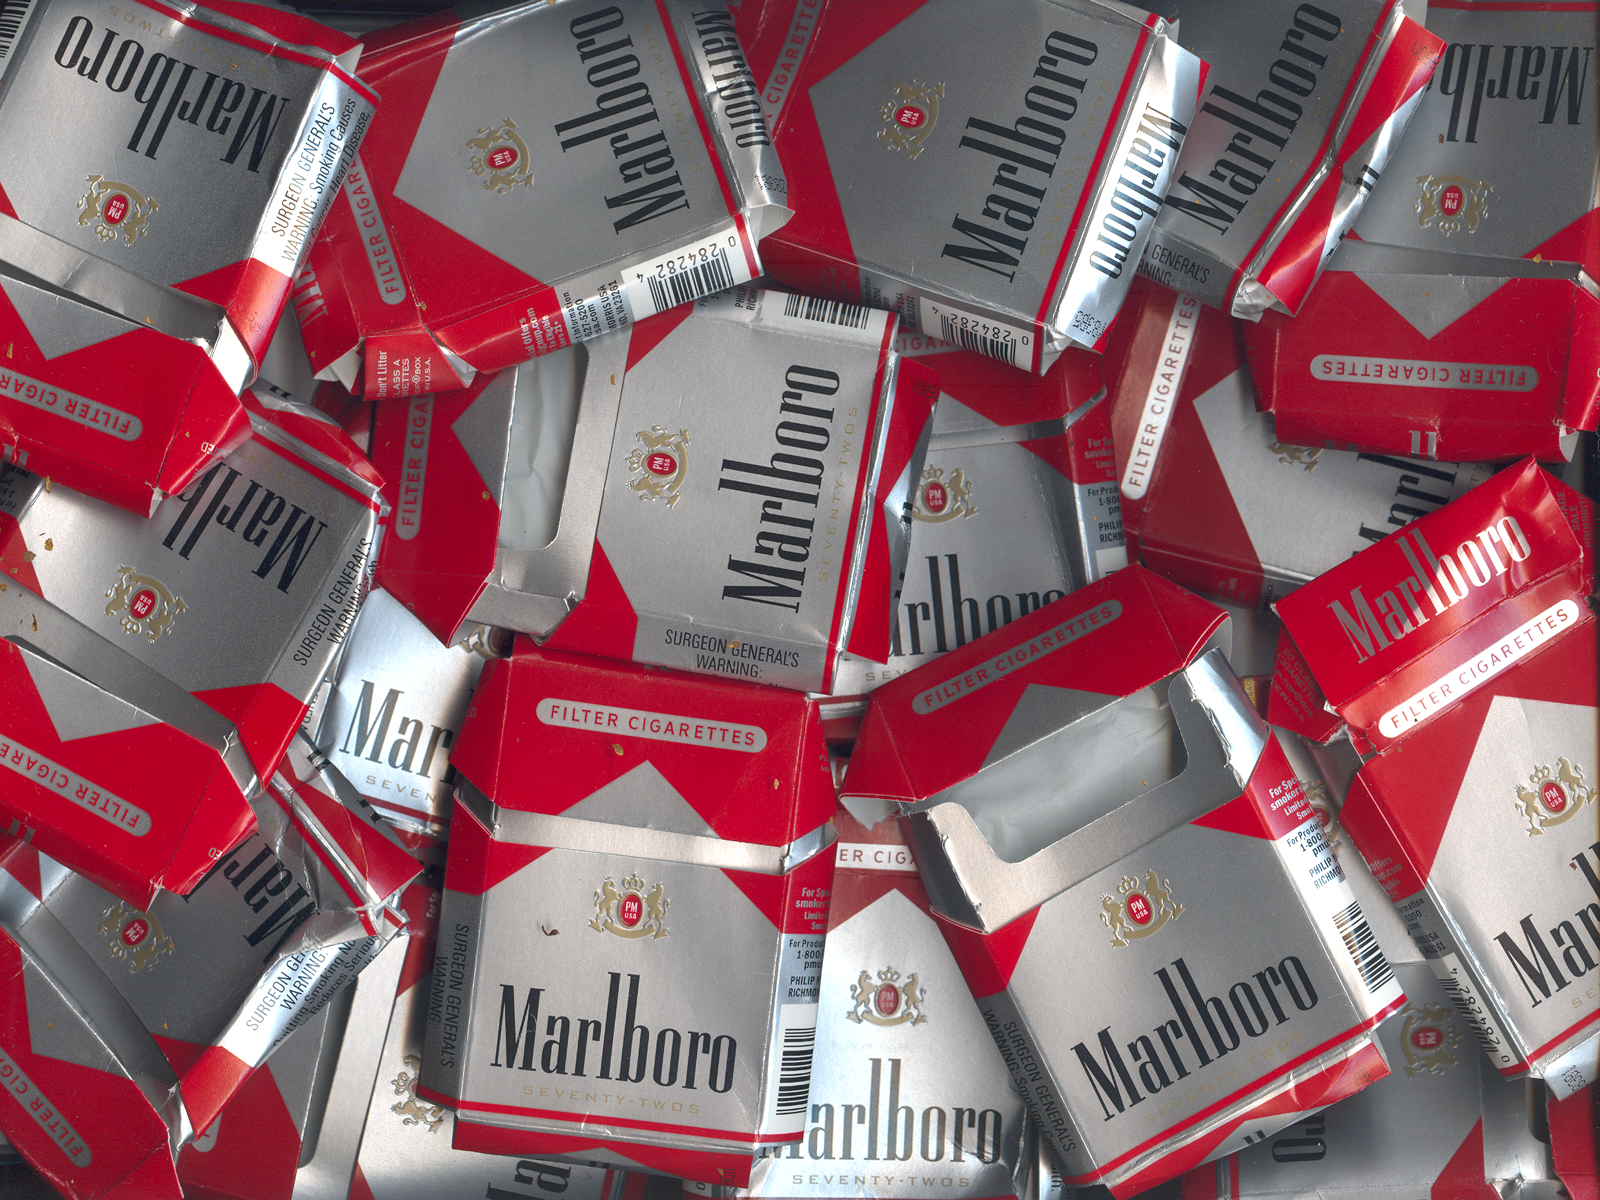 Cigarettes Marlboro Wallpaper 1600x1200 Cigarettes Marlboro 1600x1200